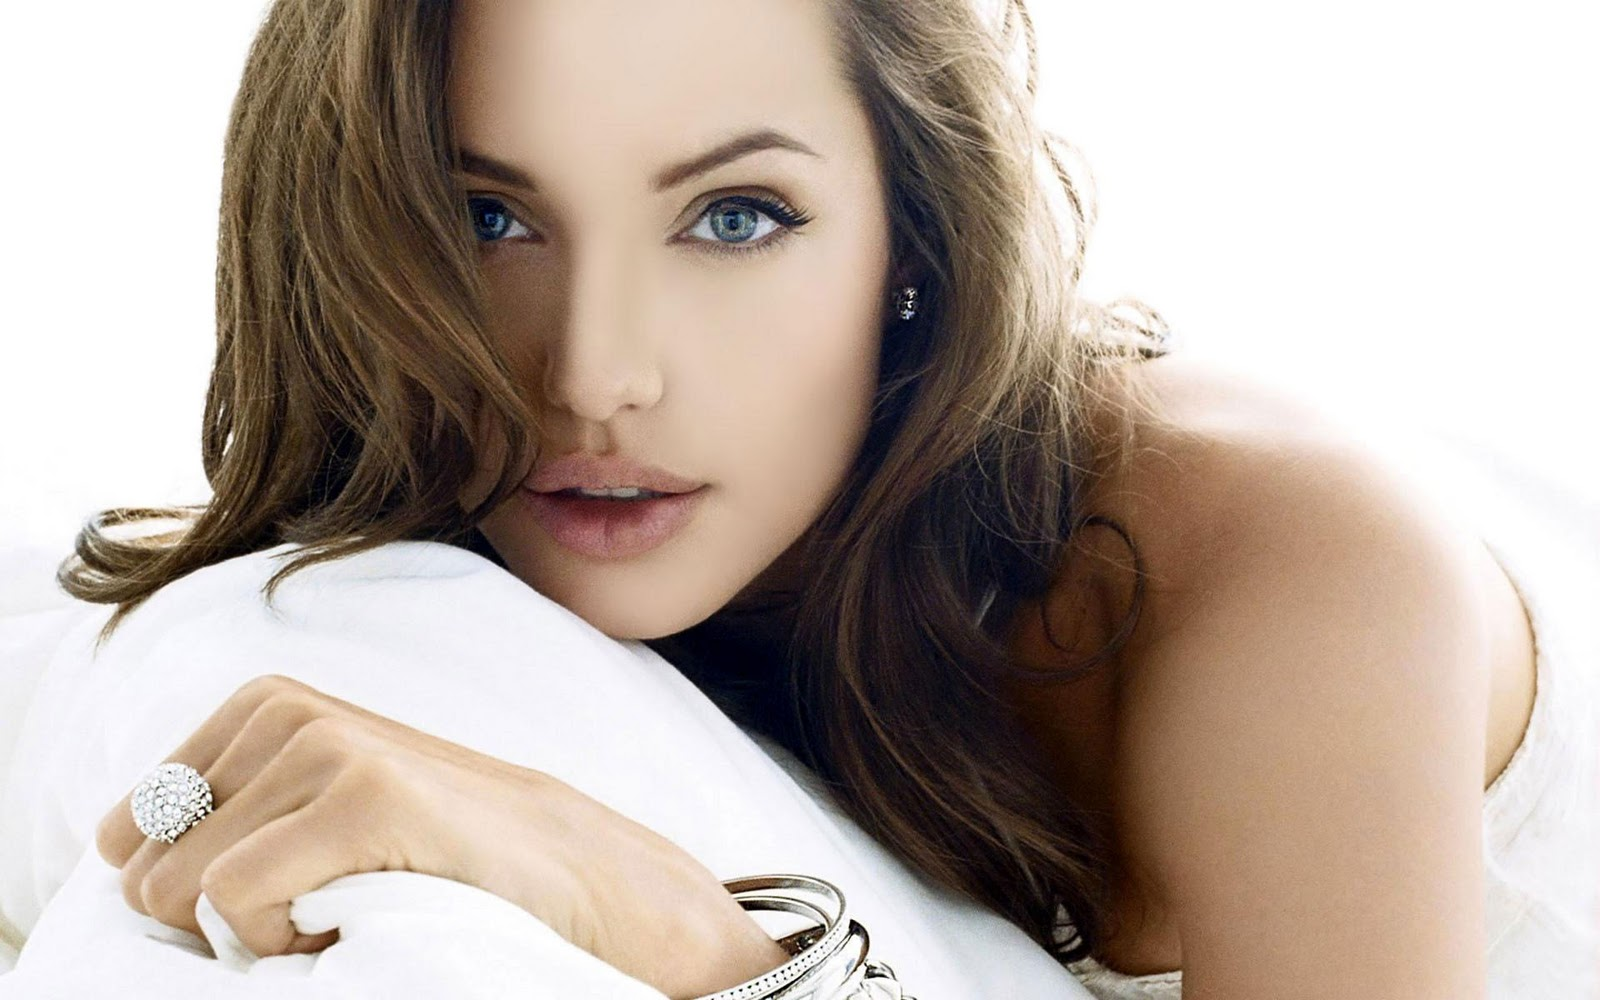 HD Wallpepars: Angelina Jolie HD Wallpapers(4)